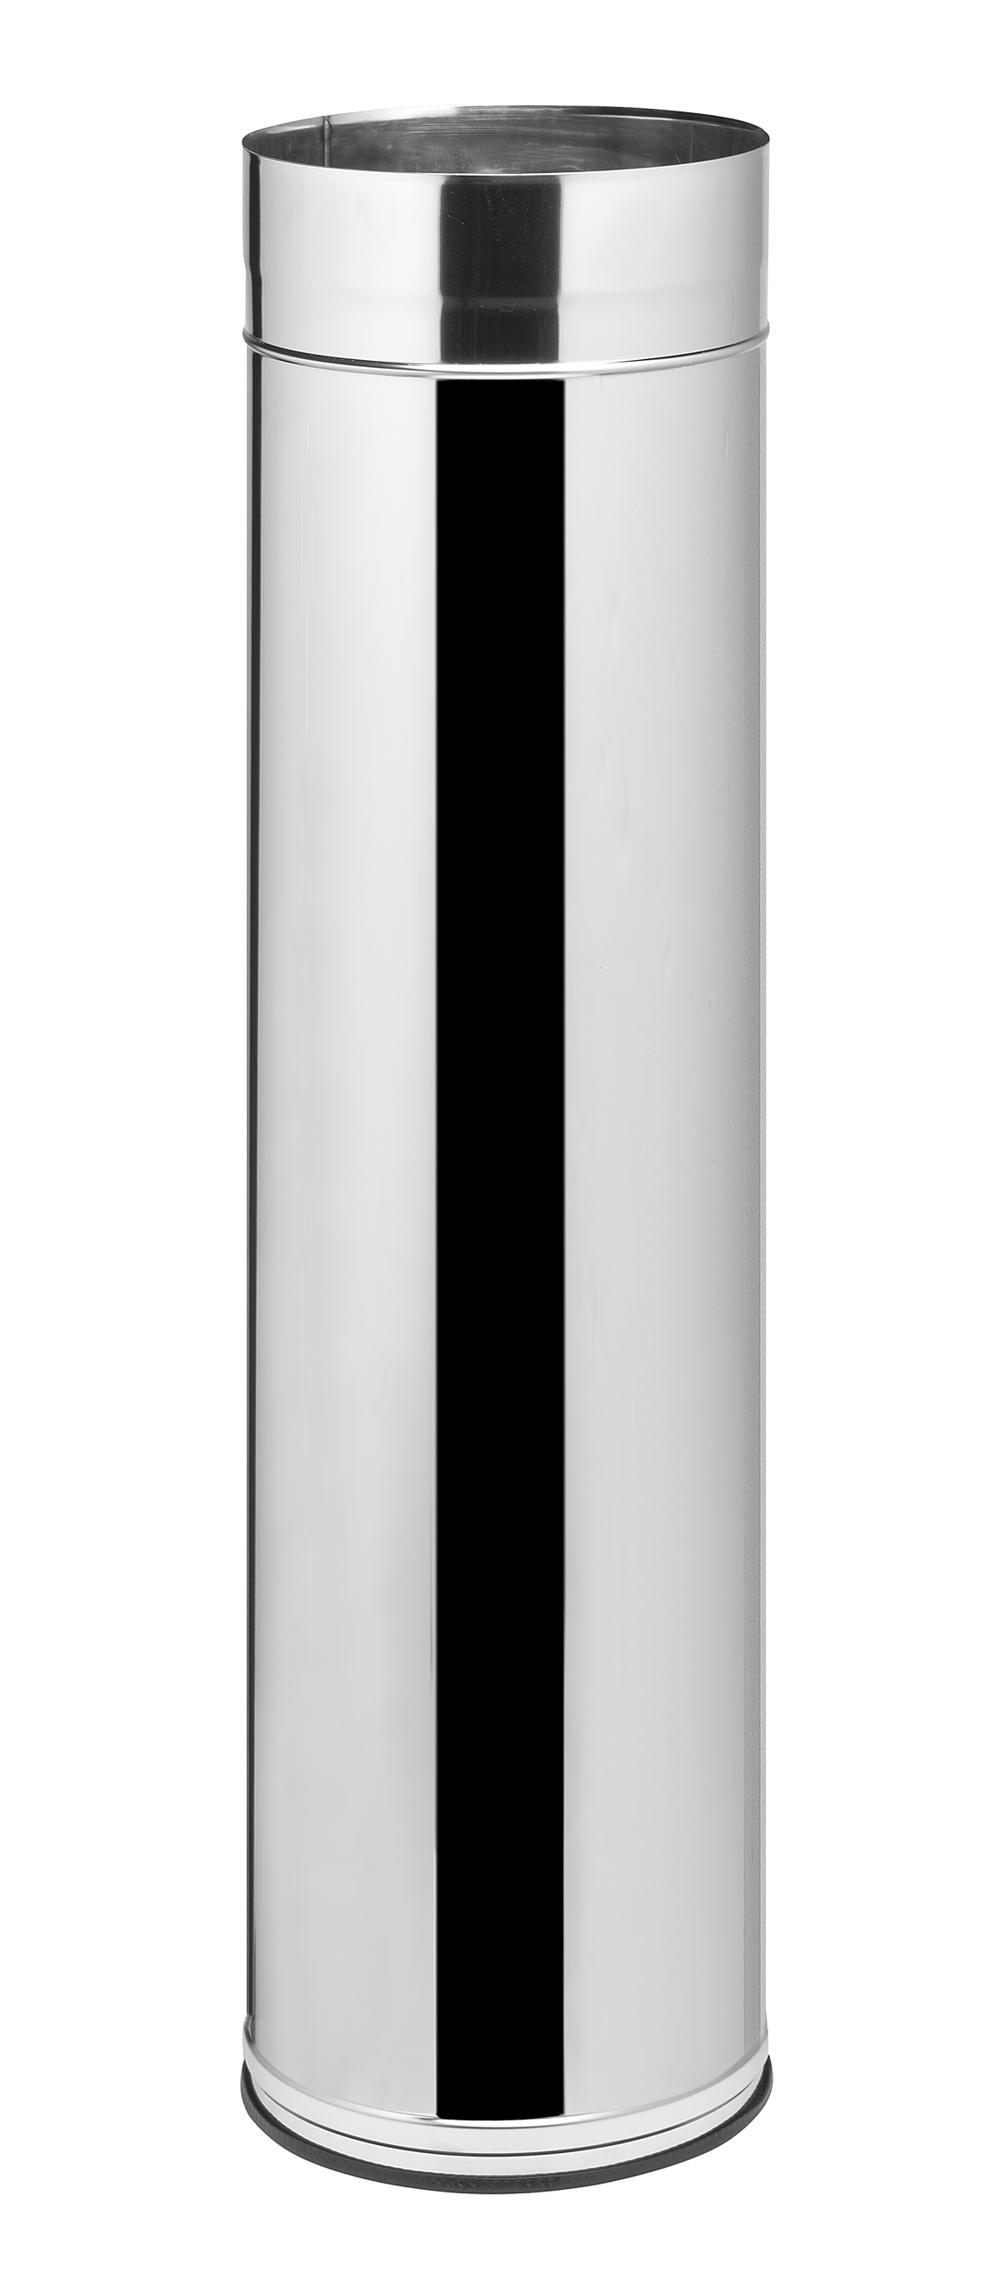 Finalrohr mit Kantenschutz Edelstahl Ø 250mm, 1000mm lang